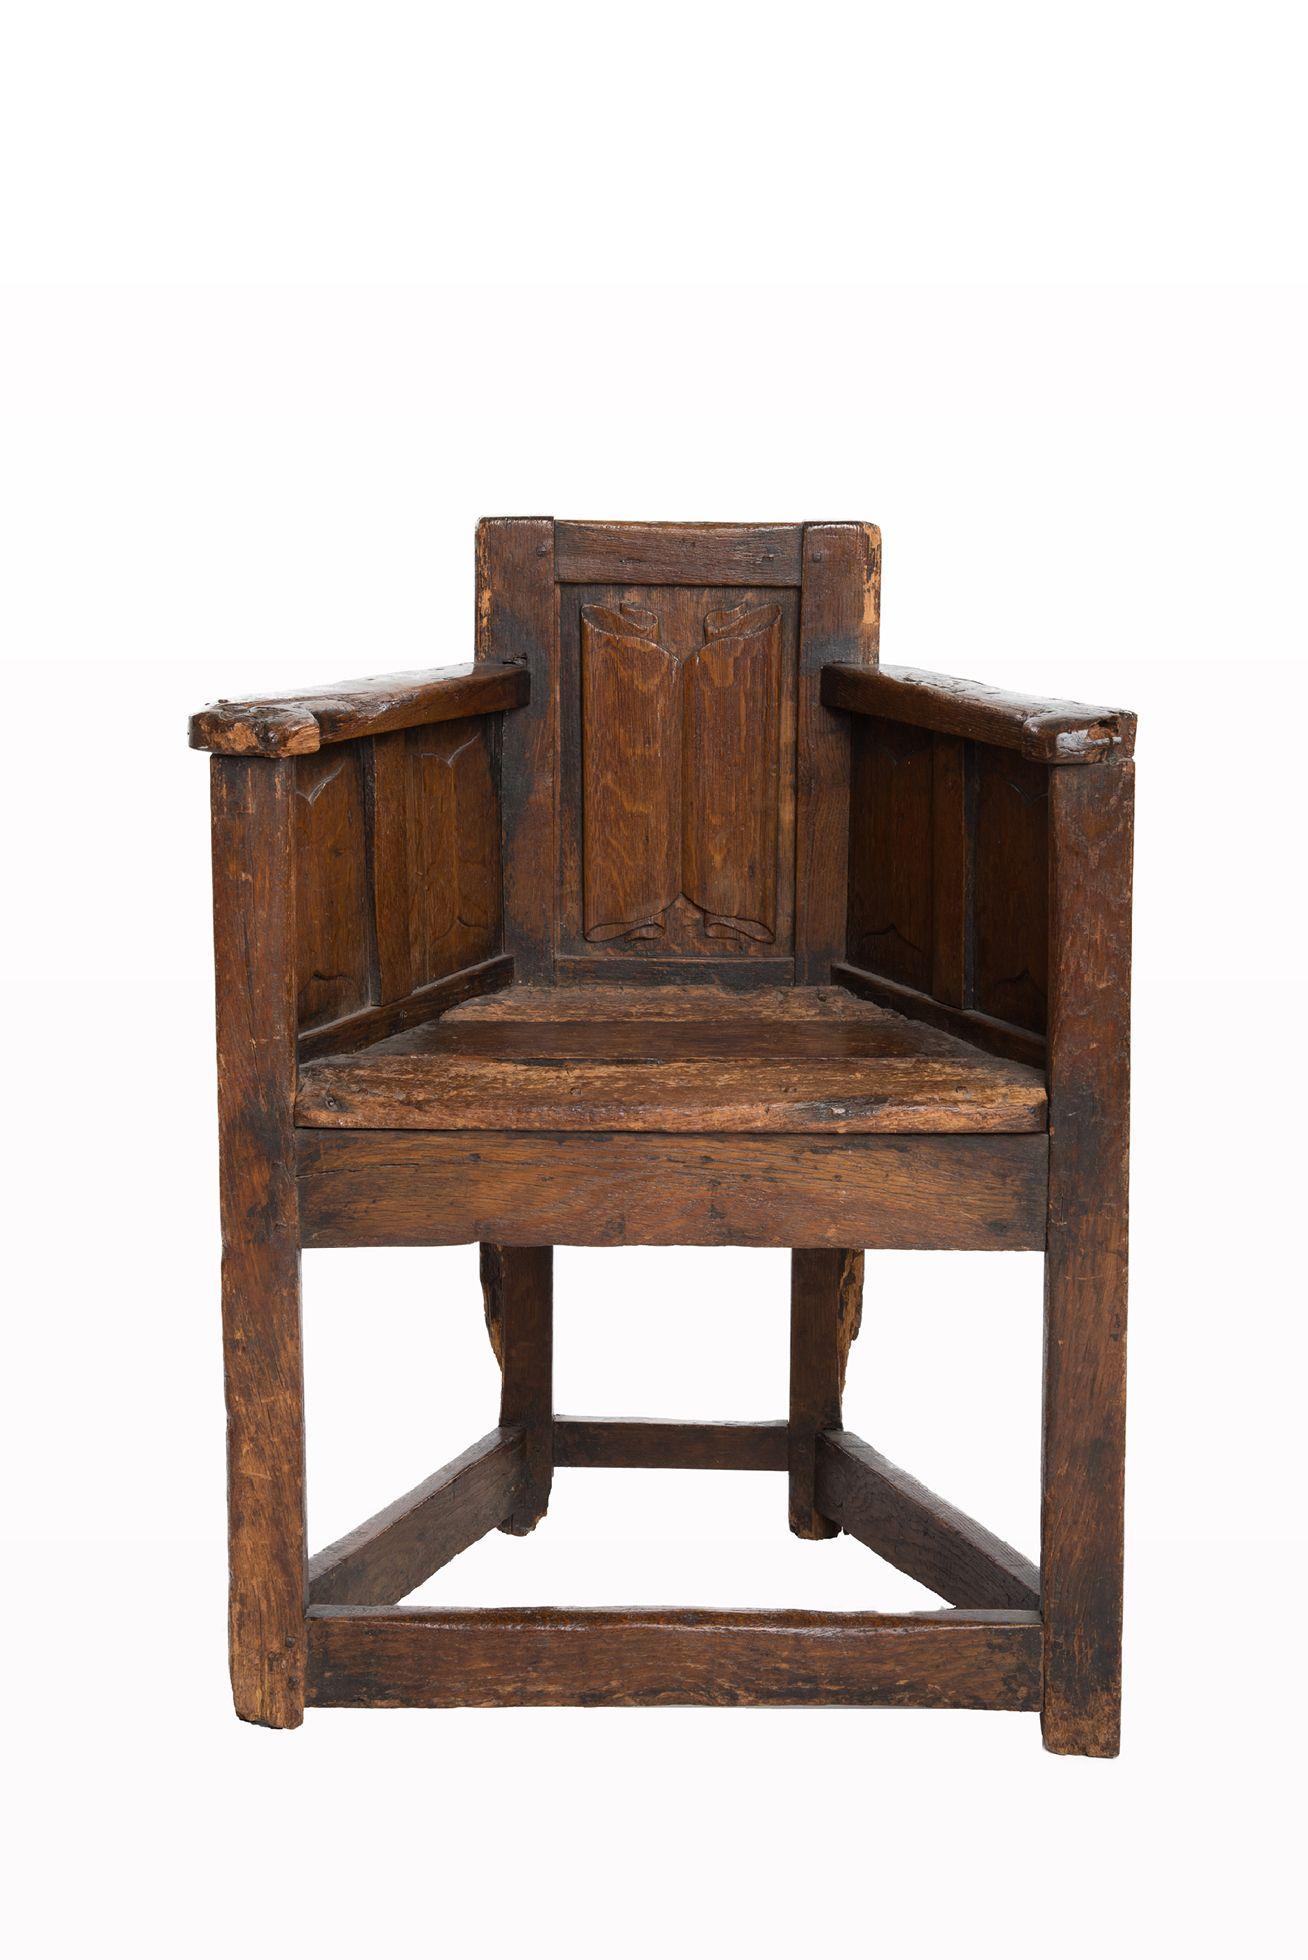 Gothic Linenfold Armchair Circa 1460 1480 Marhamchurch Antiques  # Muebles Renacentistas